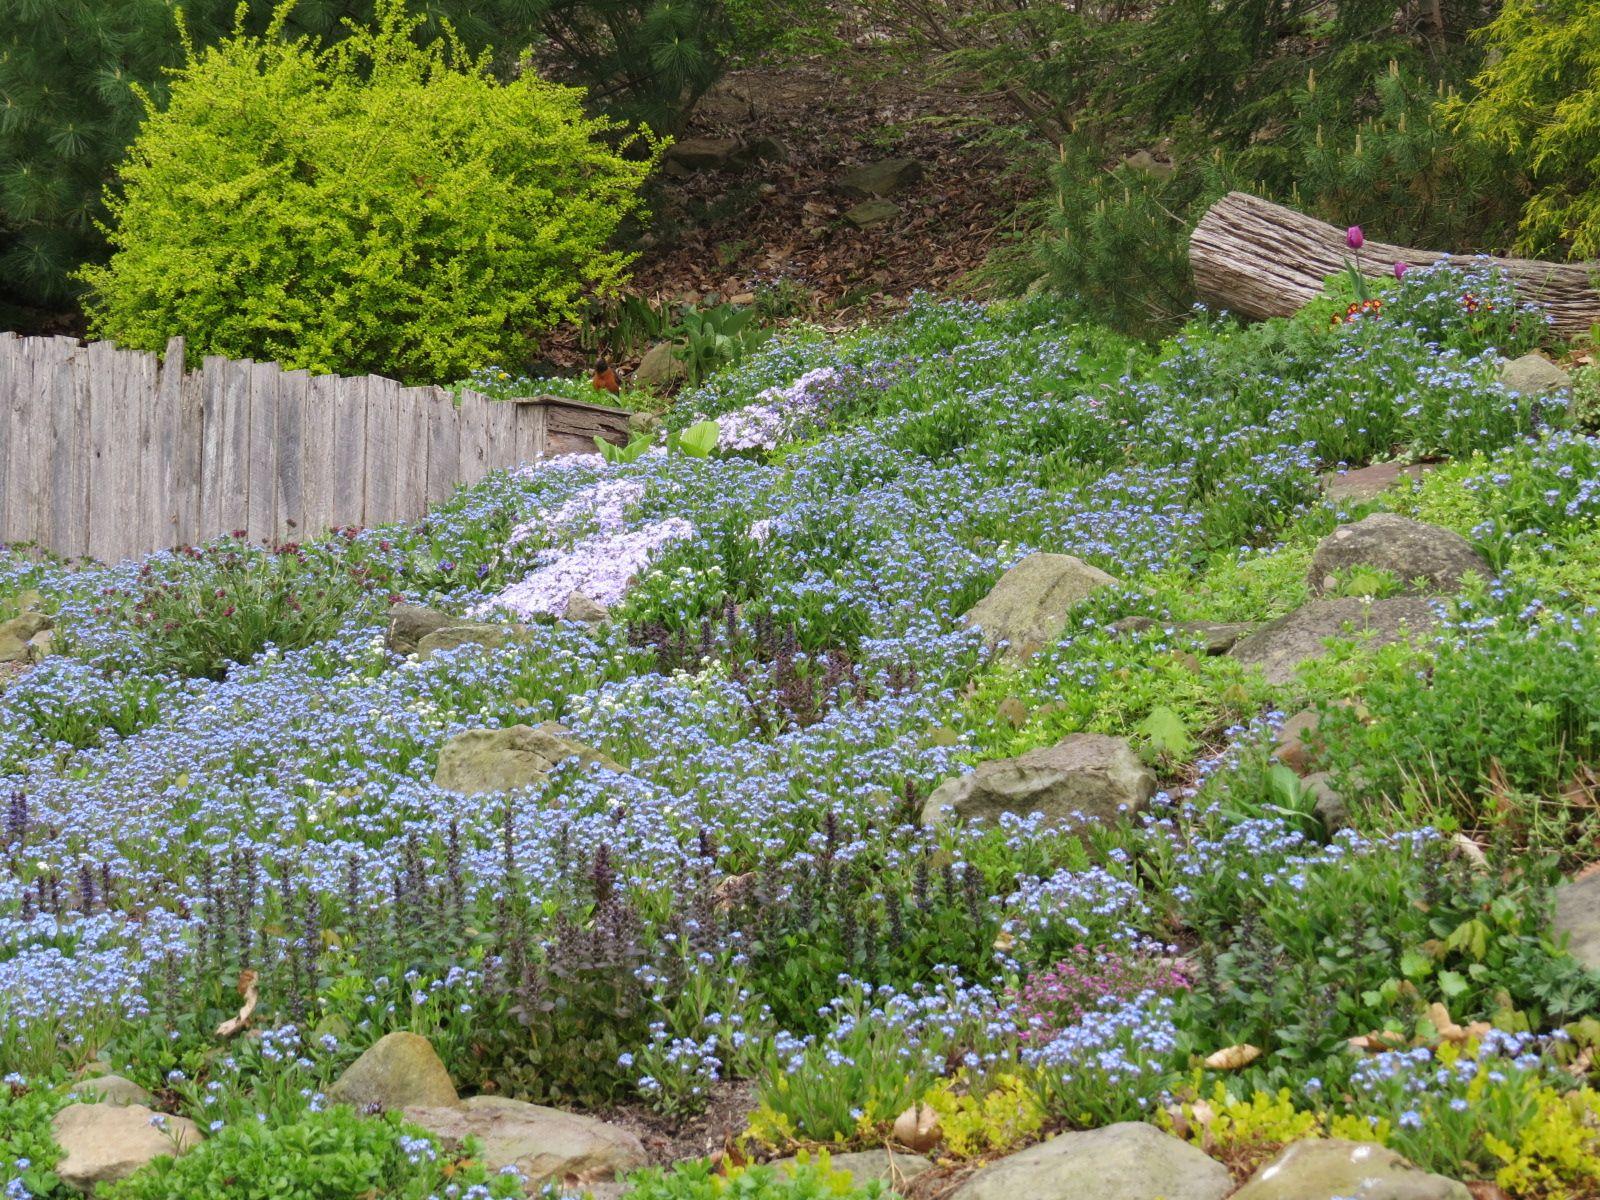 Spring flowers in shady rock garden. Visit: https://www.etsy.com/shop/GreenLeafGardens?ref=hdr_shop_menu